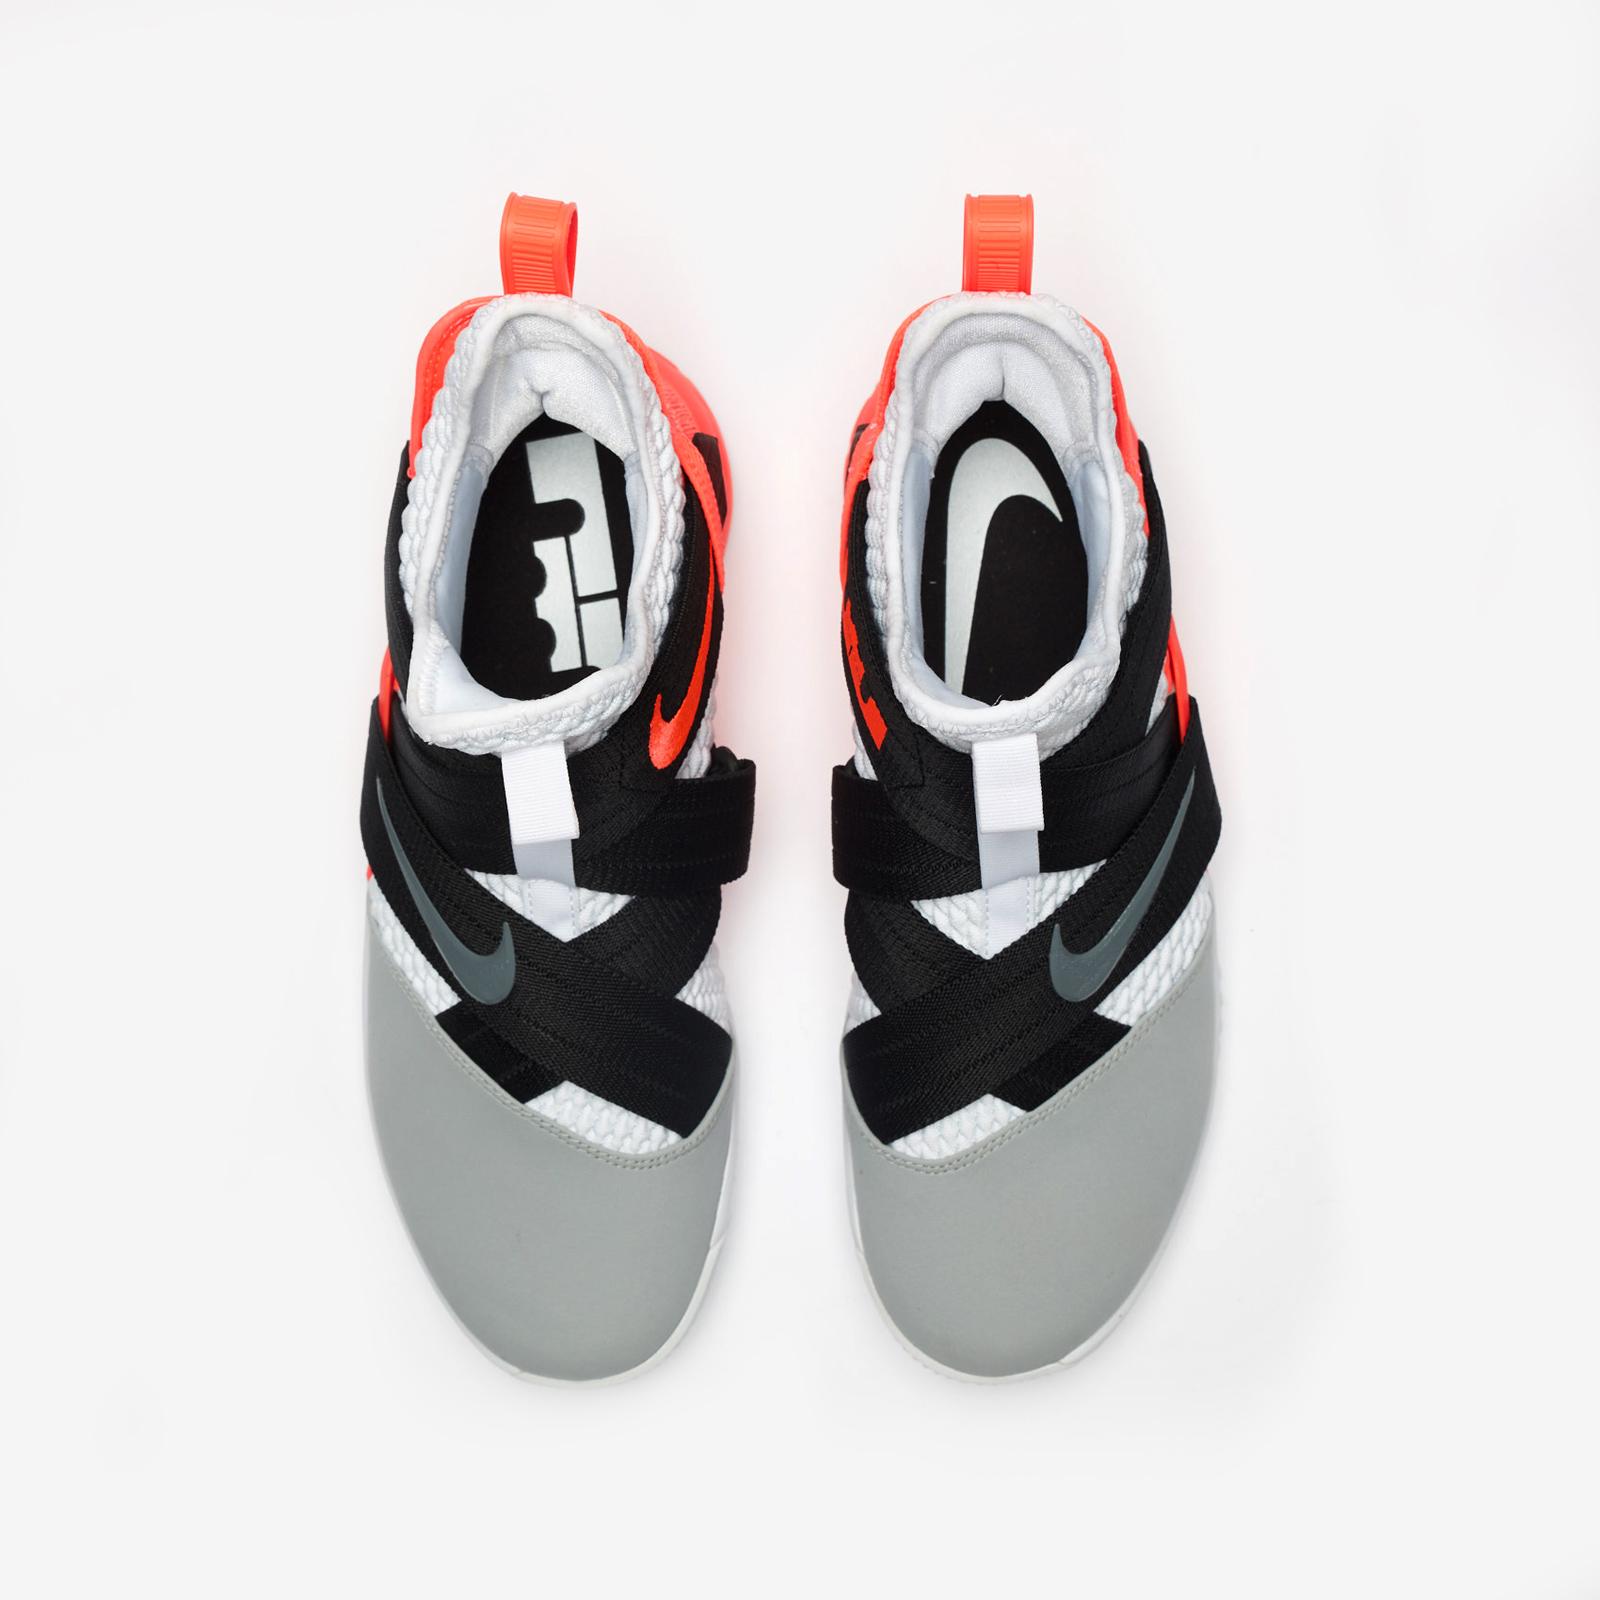 75fa57e7efe9 Nike LeBron Soldier XII SFG - Ao4054-102 - Sneakersnstuff